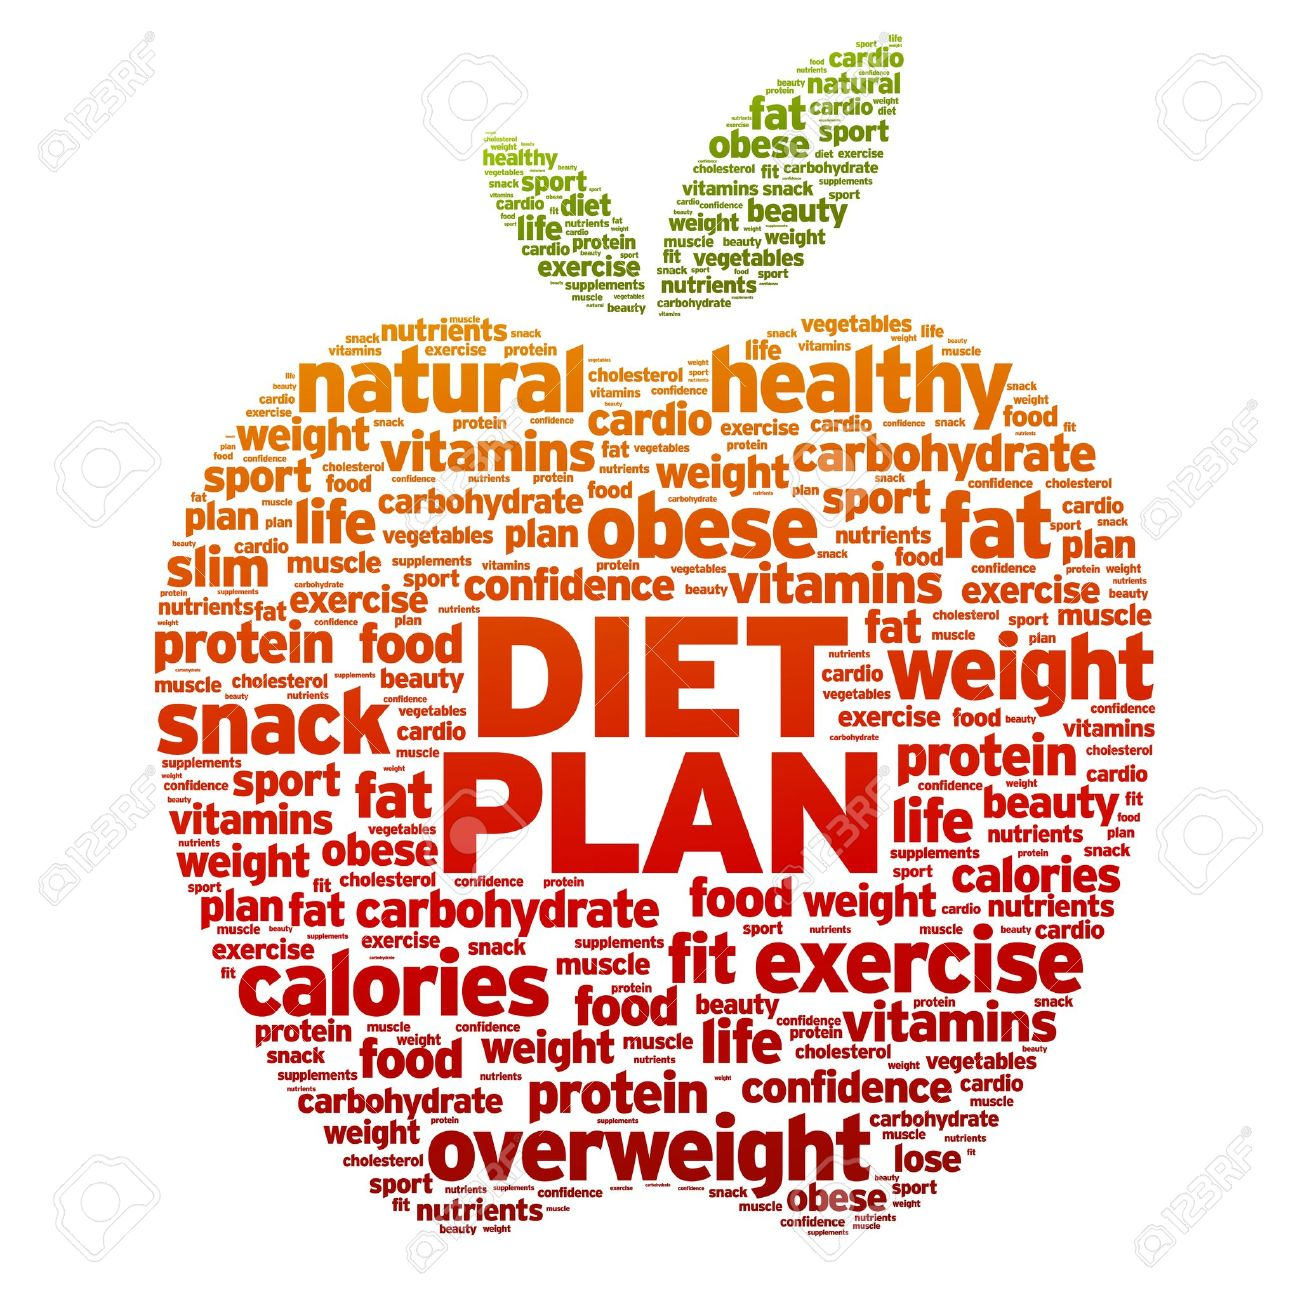 Diet plan for healthy life - Diet Plan Apple Word Illustration On White Background Stock Vector 14841158